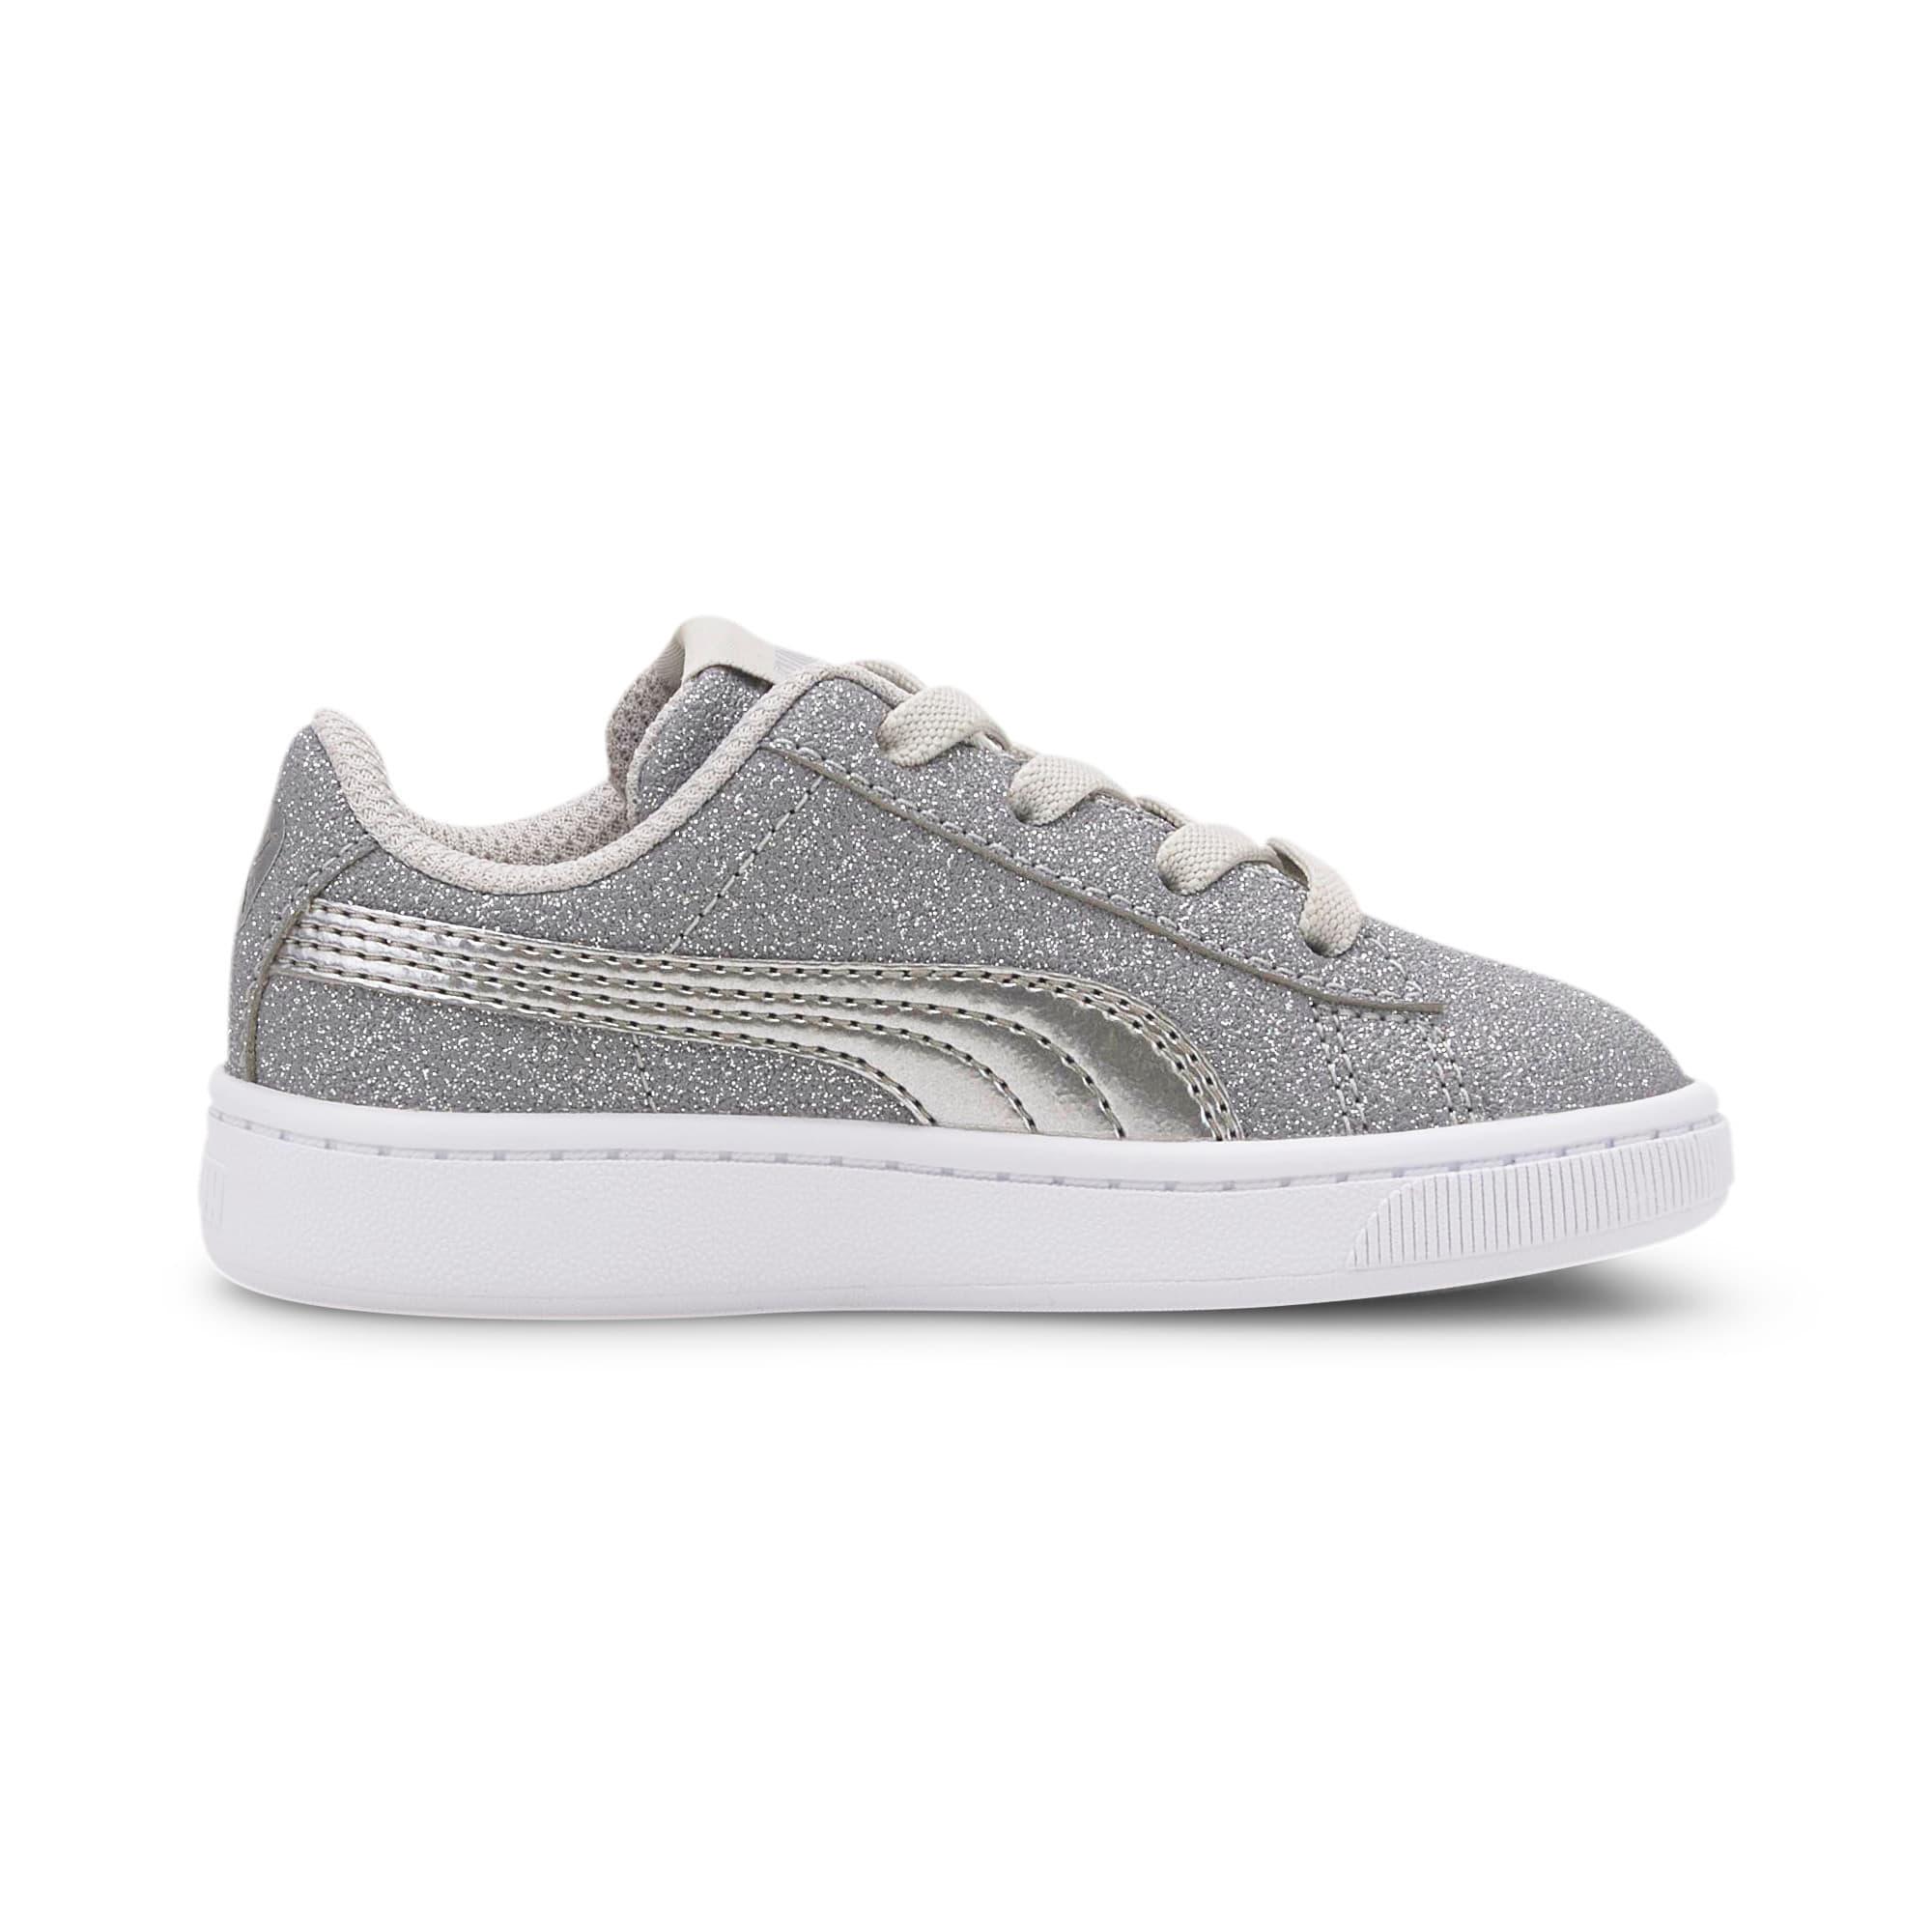 Thumbnail 5 of PUMA Vikky v2 Glitz AC Sneakers INF, Gray Violet-Silver-White, medium